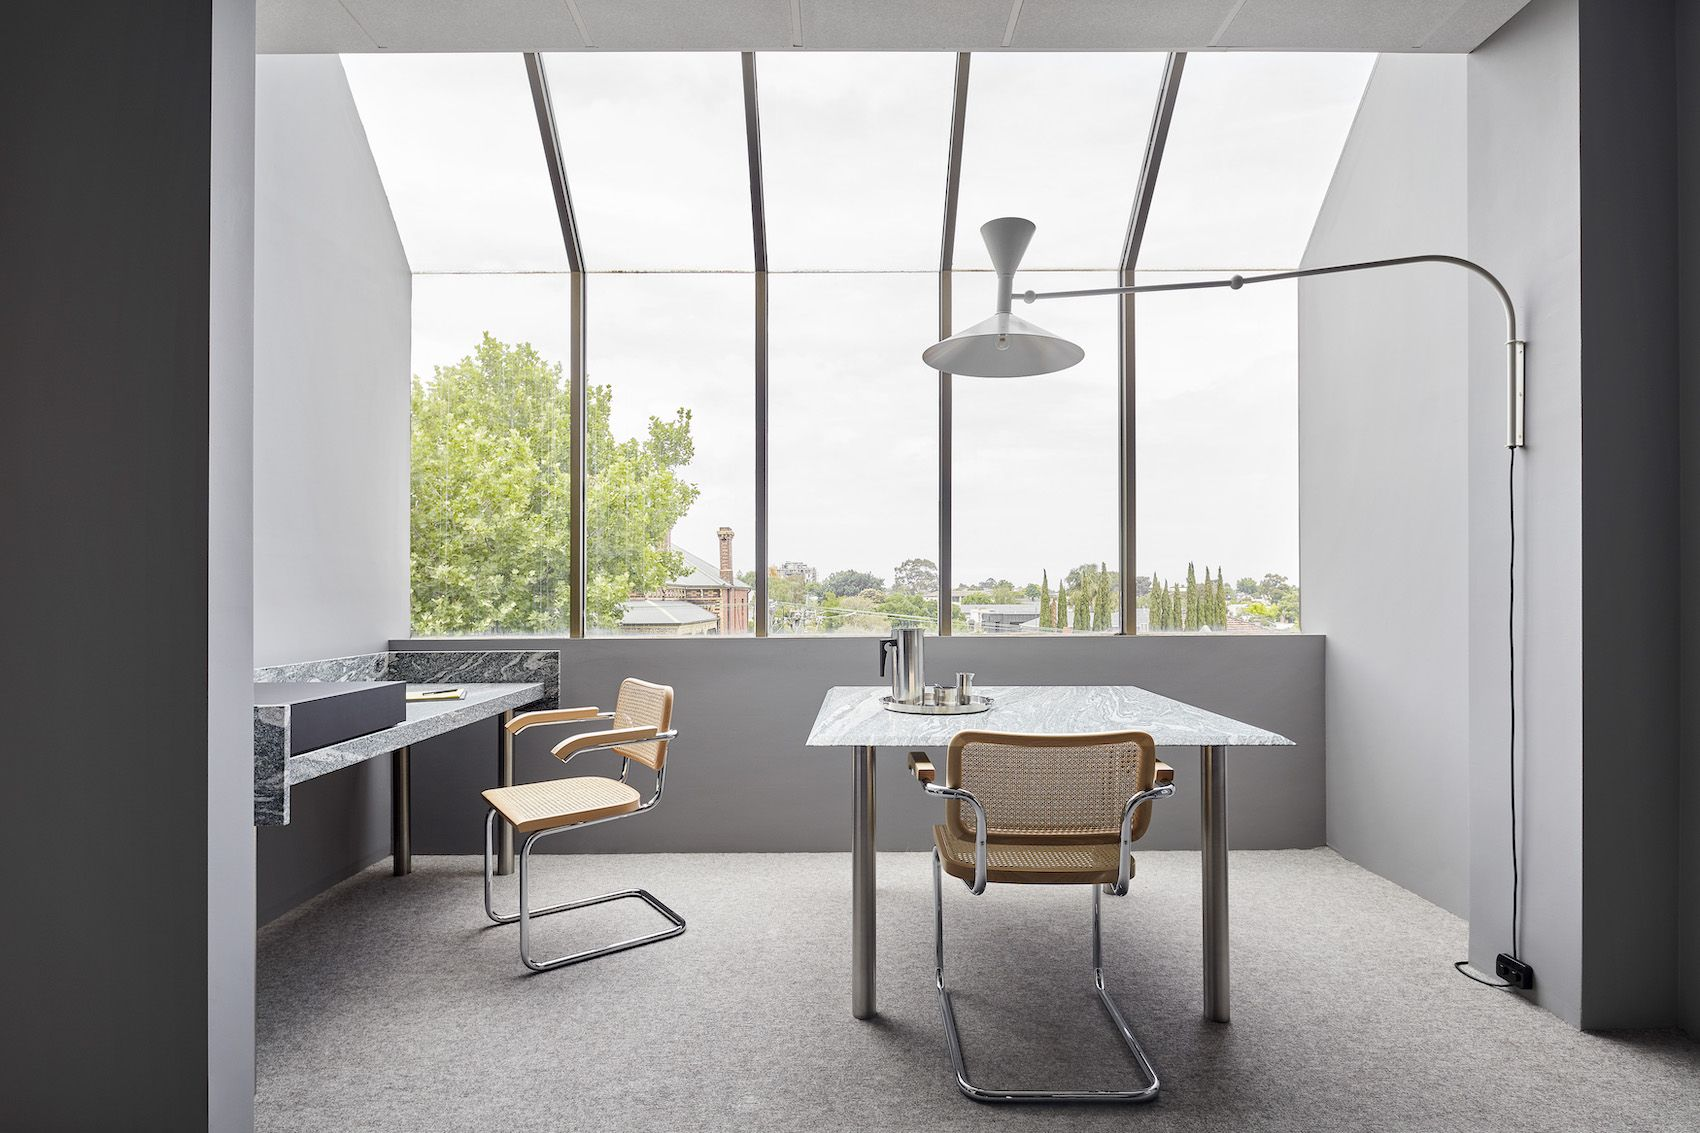 Davidov Architects Studio Minimalism Interior Studio Interior Architect Design